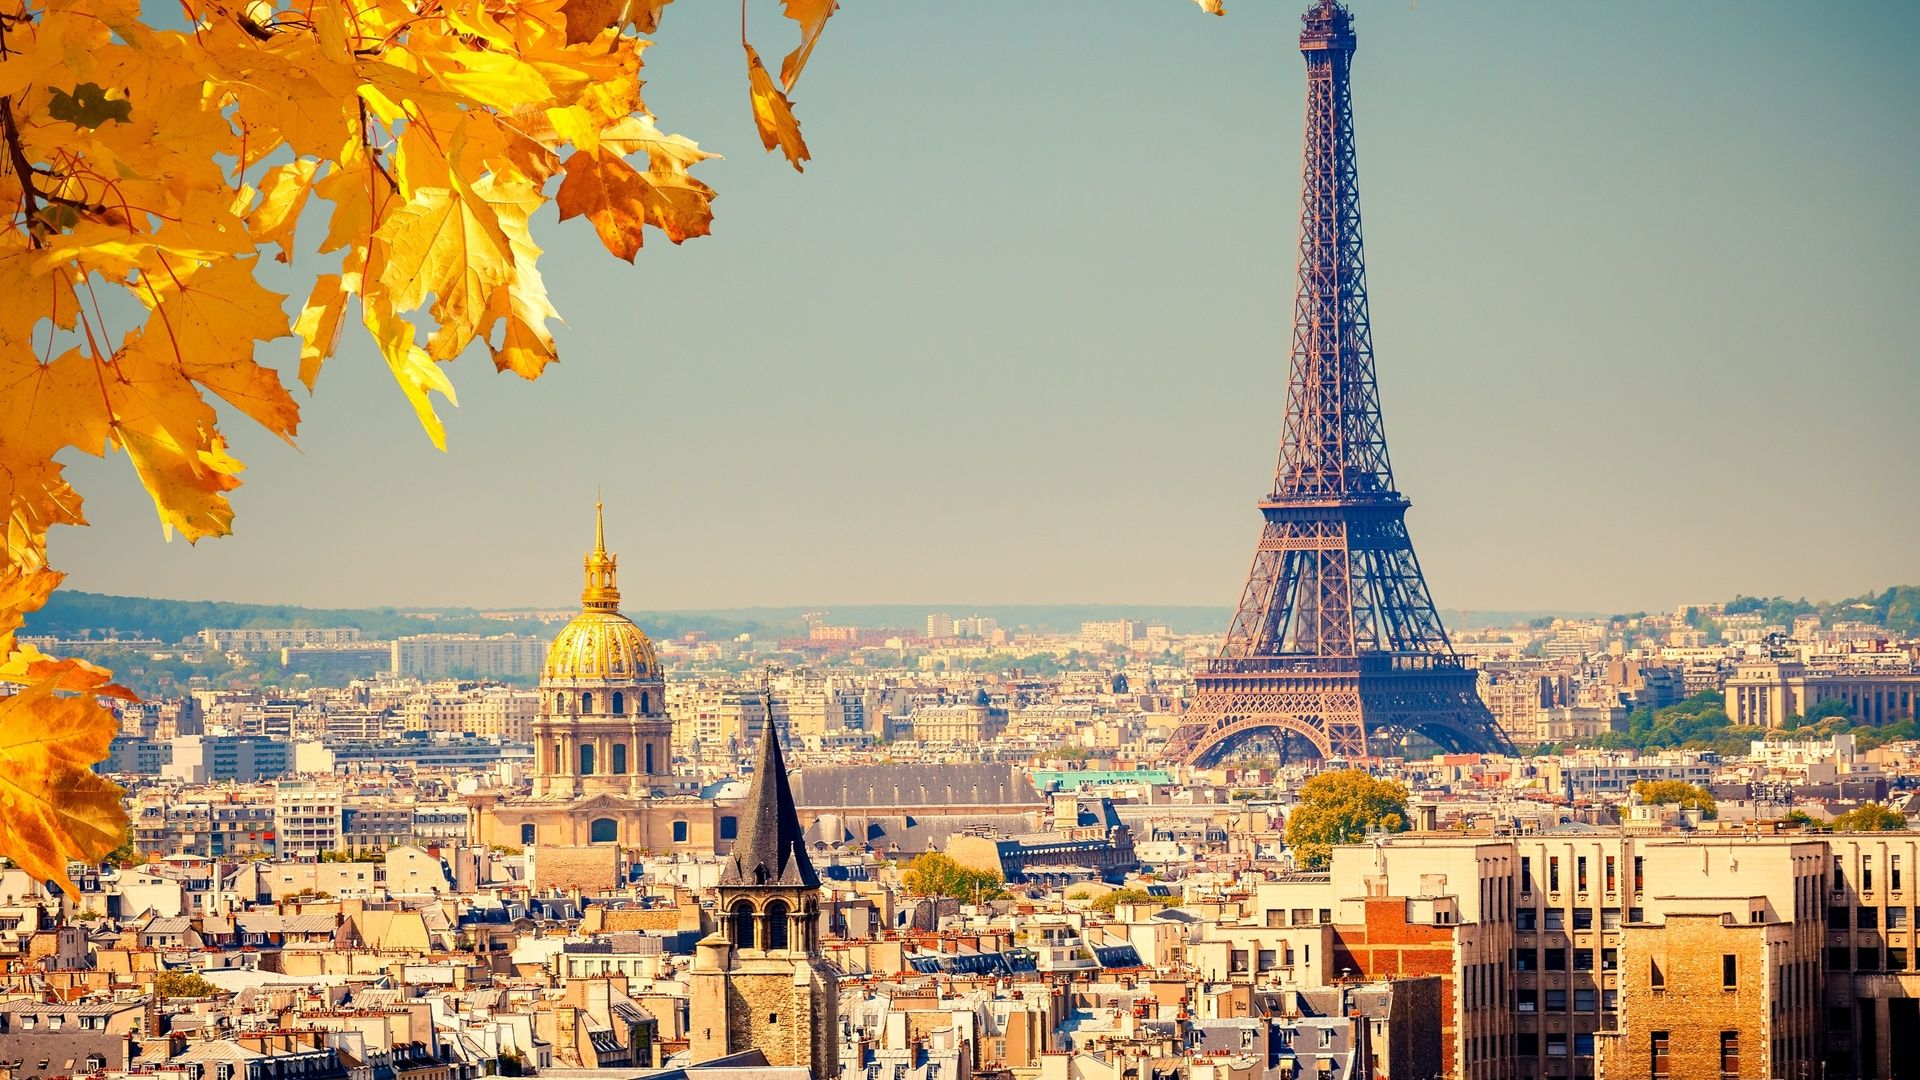 Обои Eiffel tower, france, paris, la tour eiffel. Города foto 15